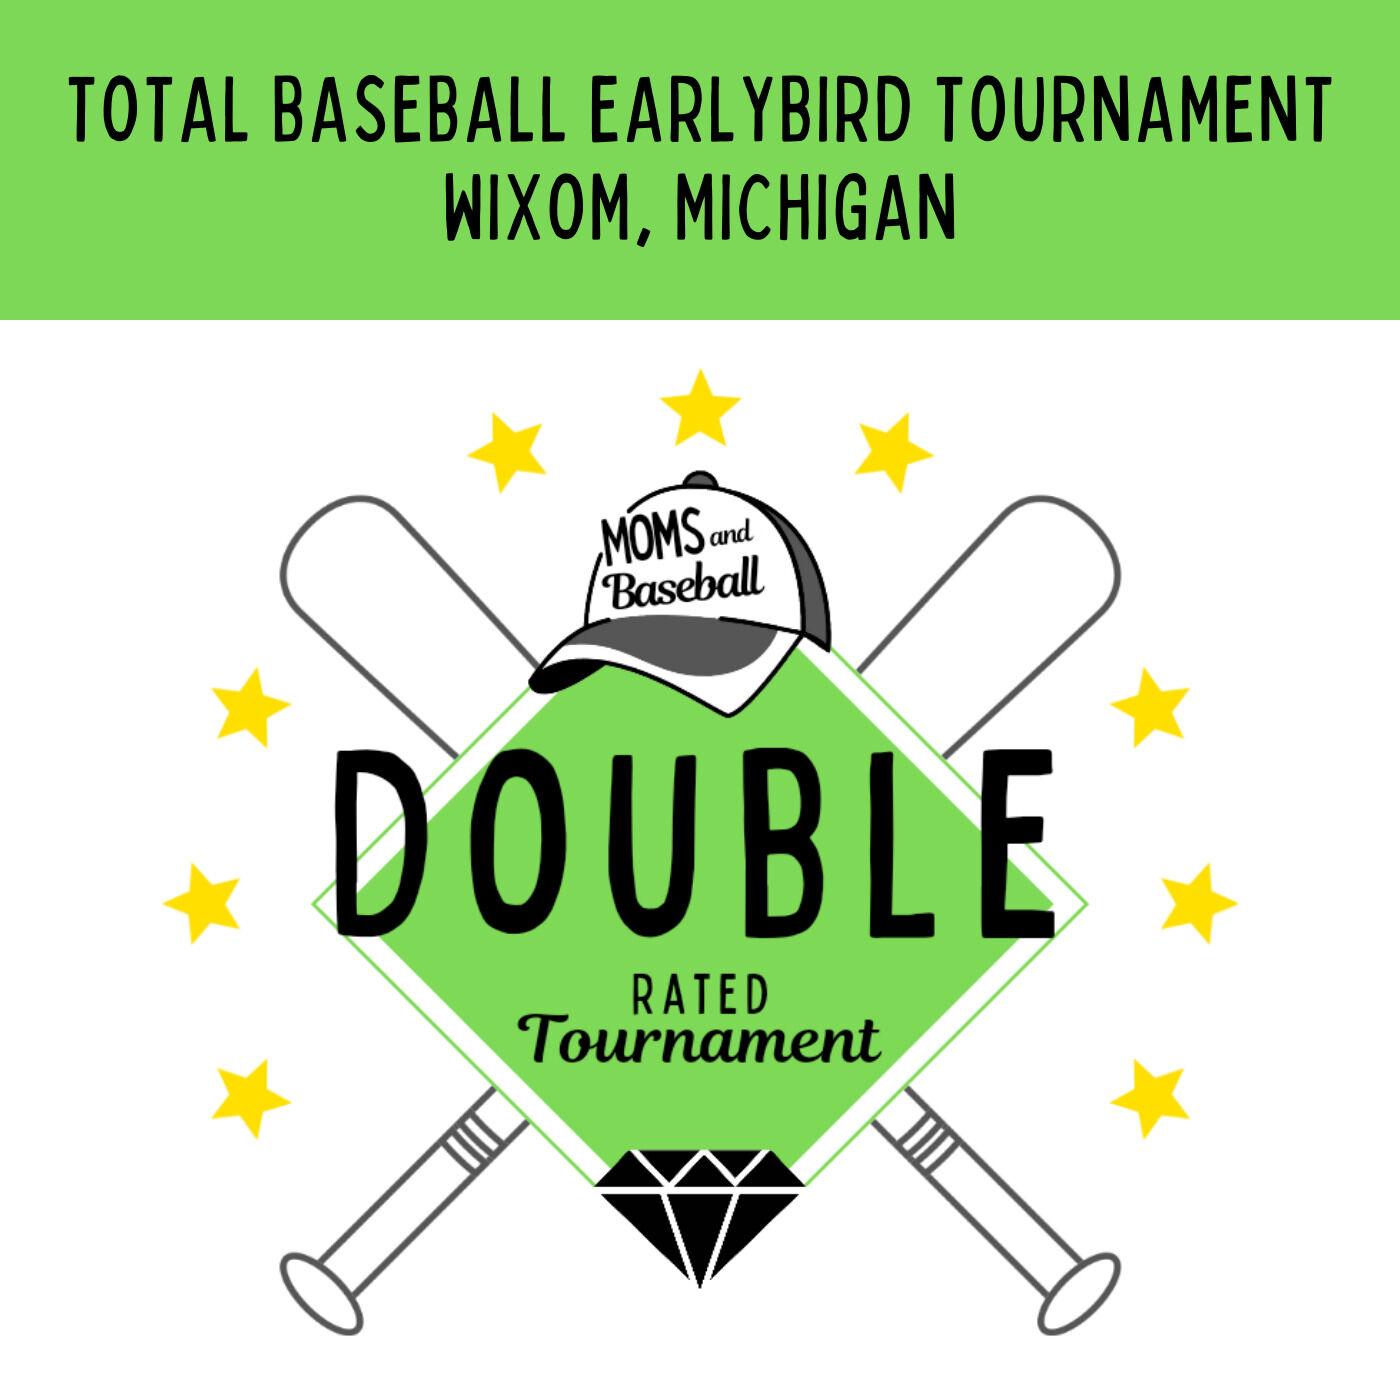 038: Total Baseball Earlybird Tournament Review (Michigan)